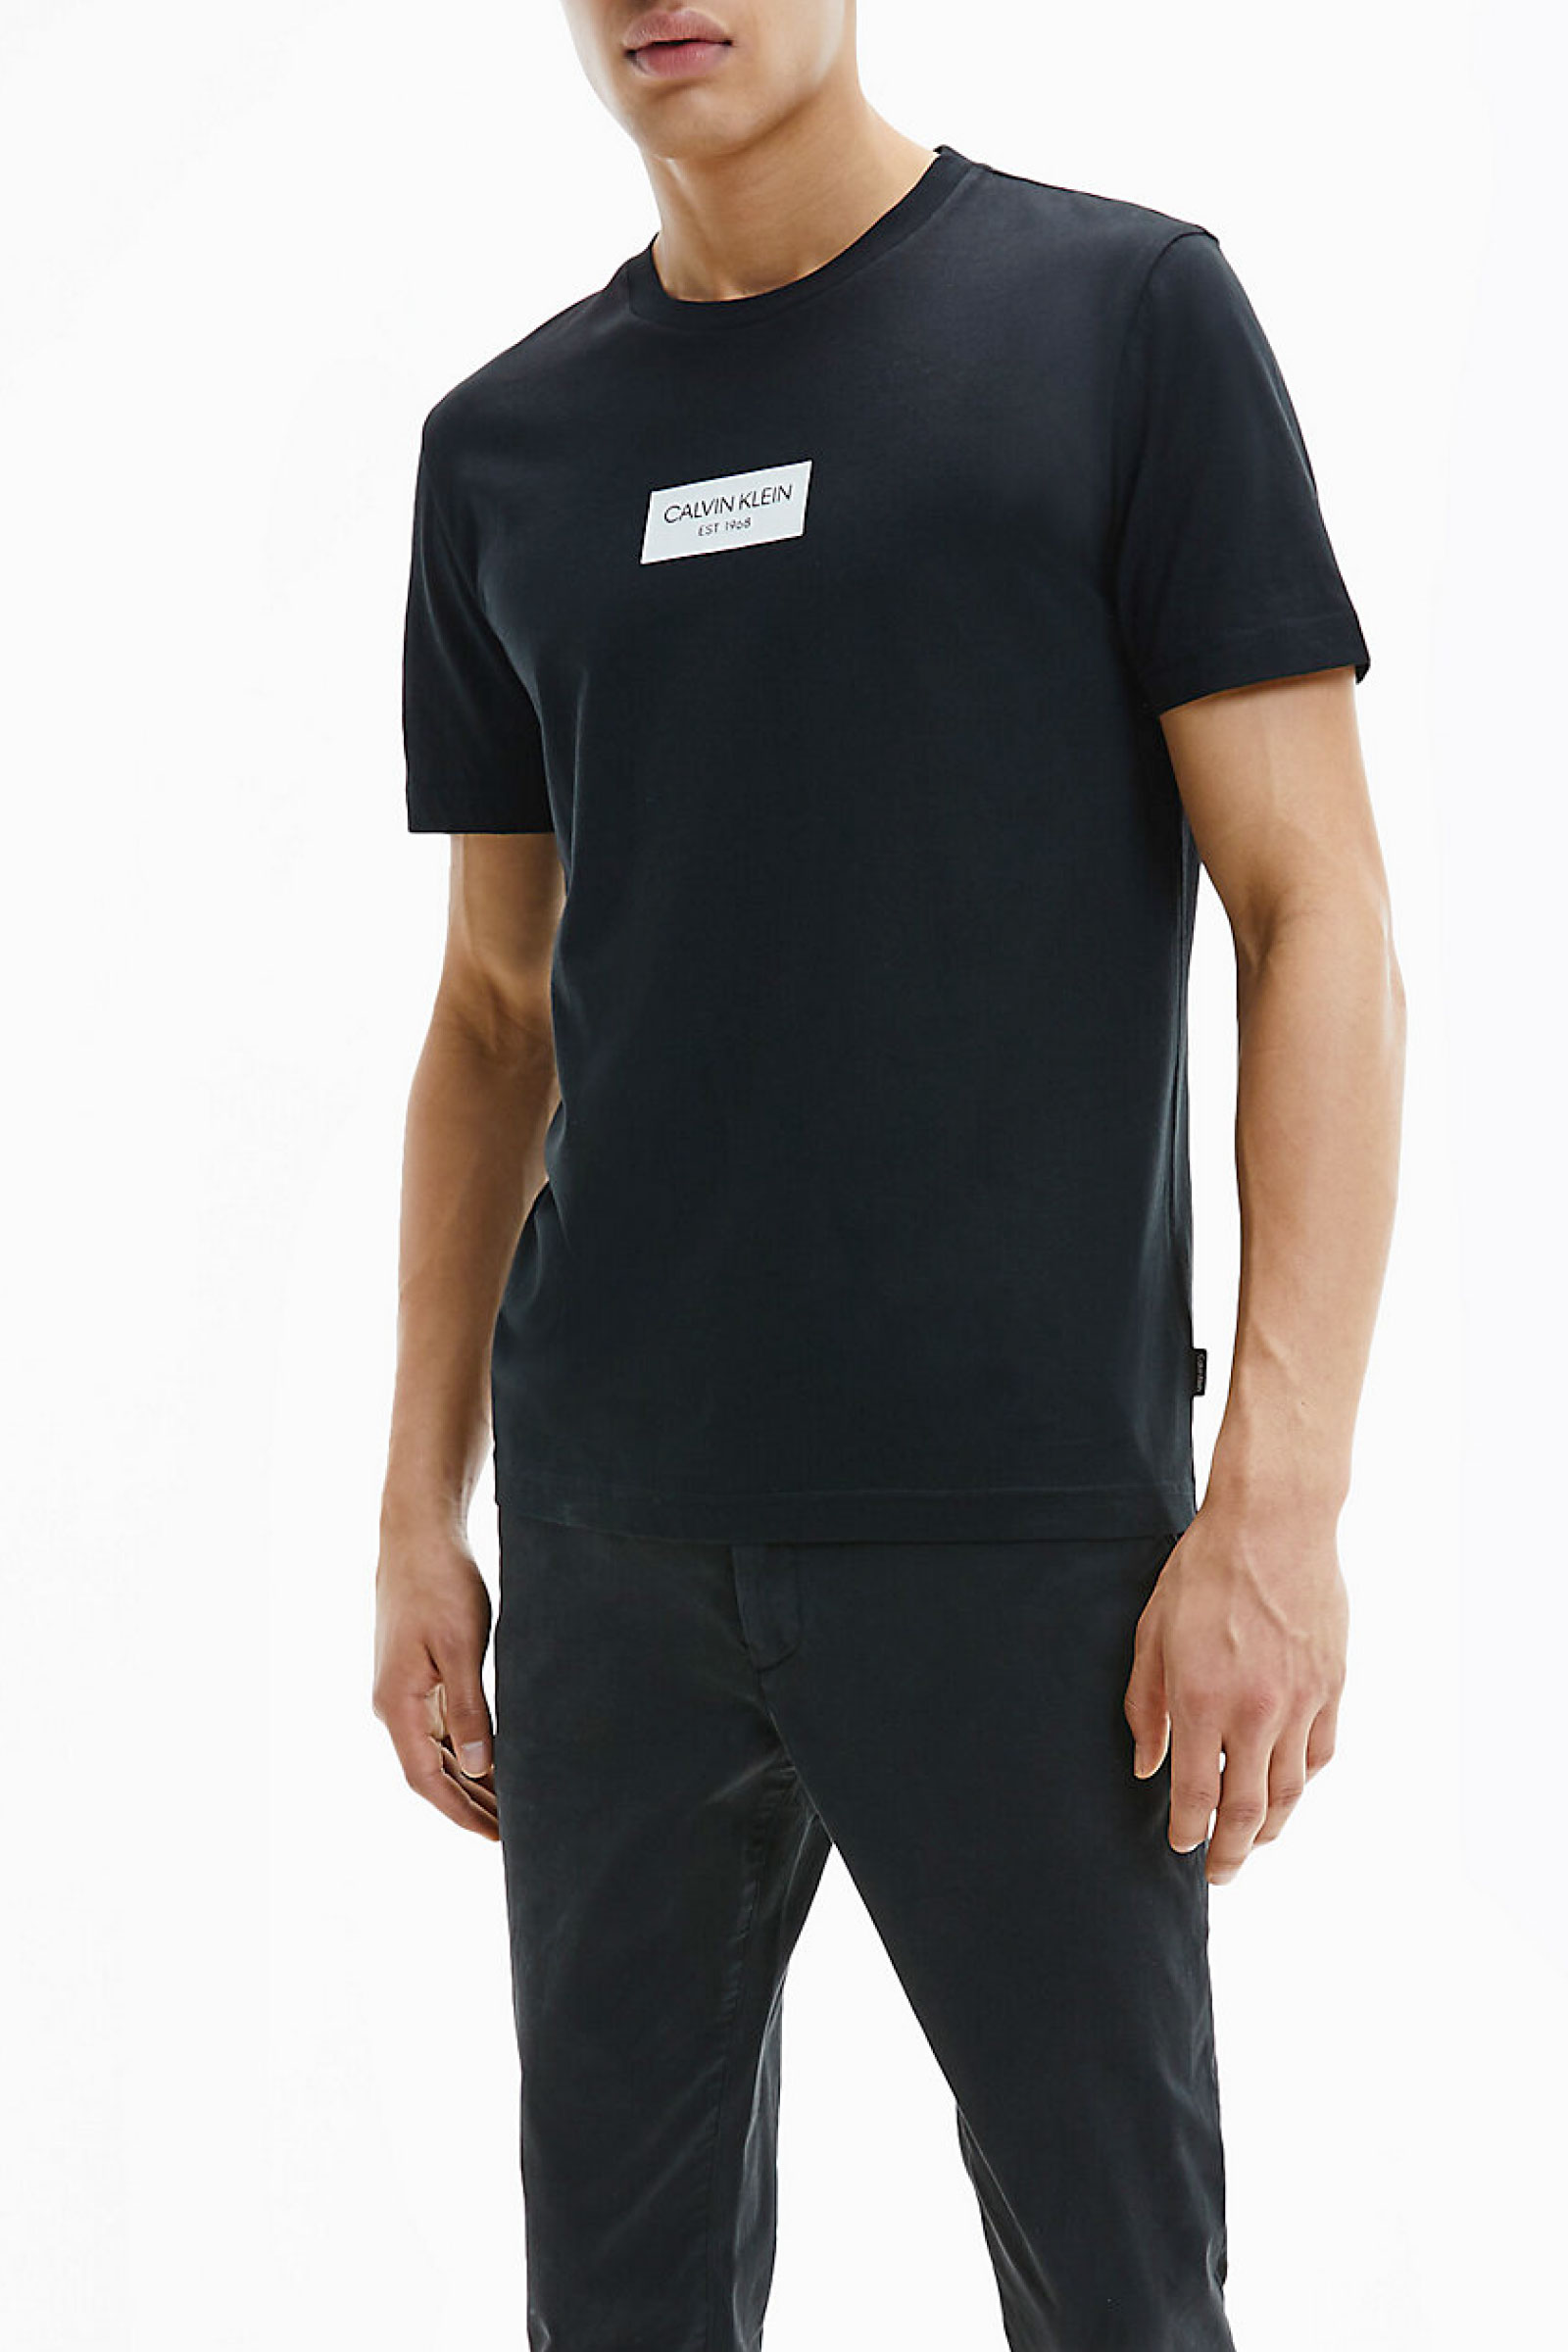 CALVIN KLEIN Men's T-Shirt CALVIN KLEIN | T-Shirt | K10K106484BEH